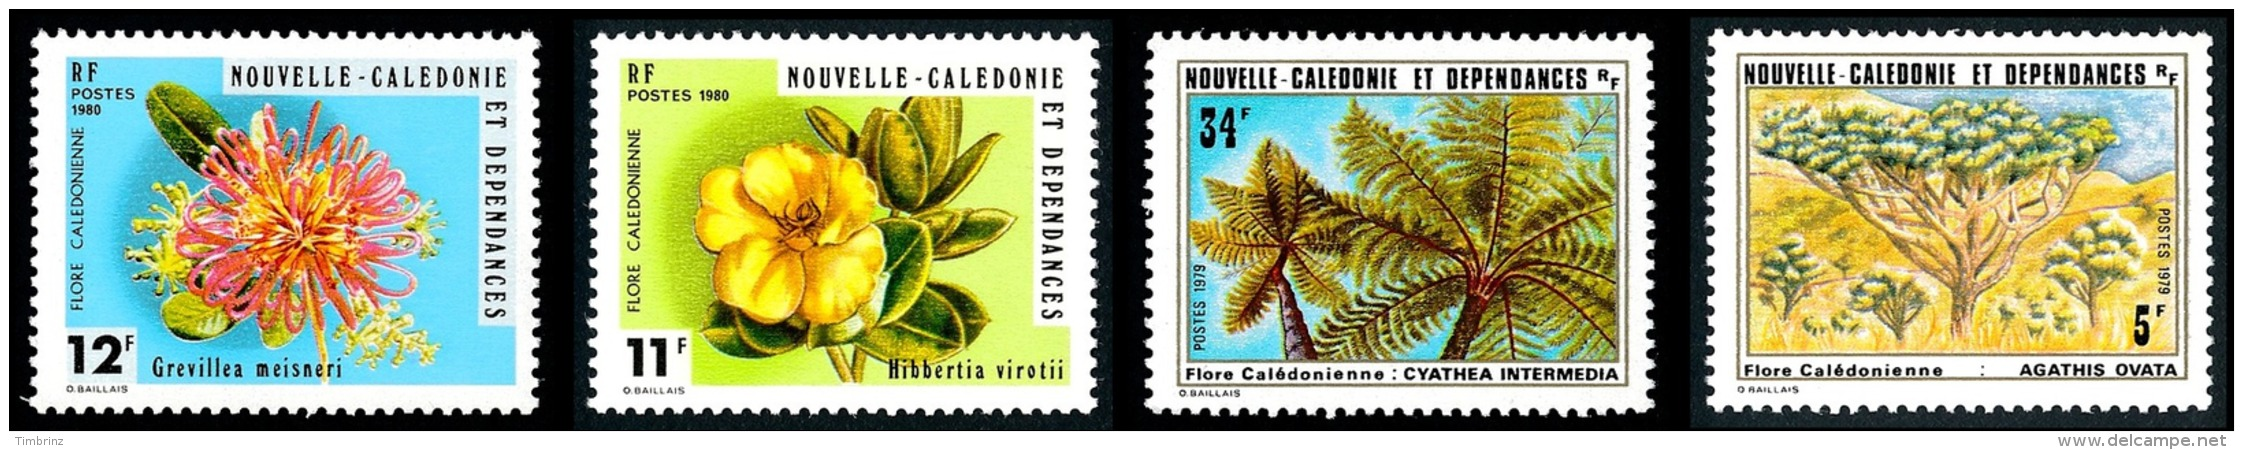 NOUV.-CALEDONIE 1979 - Yv. 431 432 436 437 **   Cote= 7,40 EUR - Flore: Aghatis, Cyathea, ... (4 Val.)  ..Réf.NCE23856 - Neukaledonien